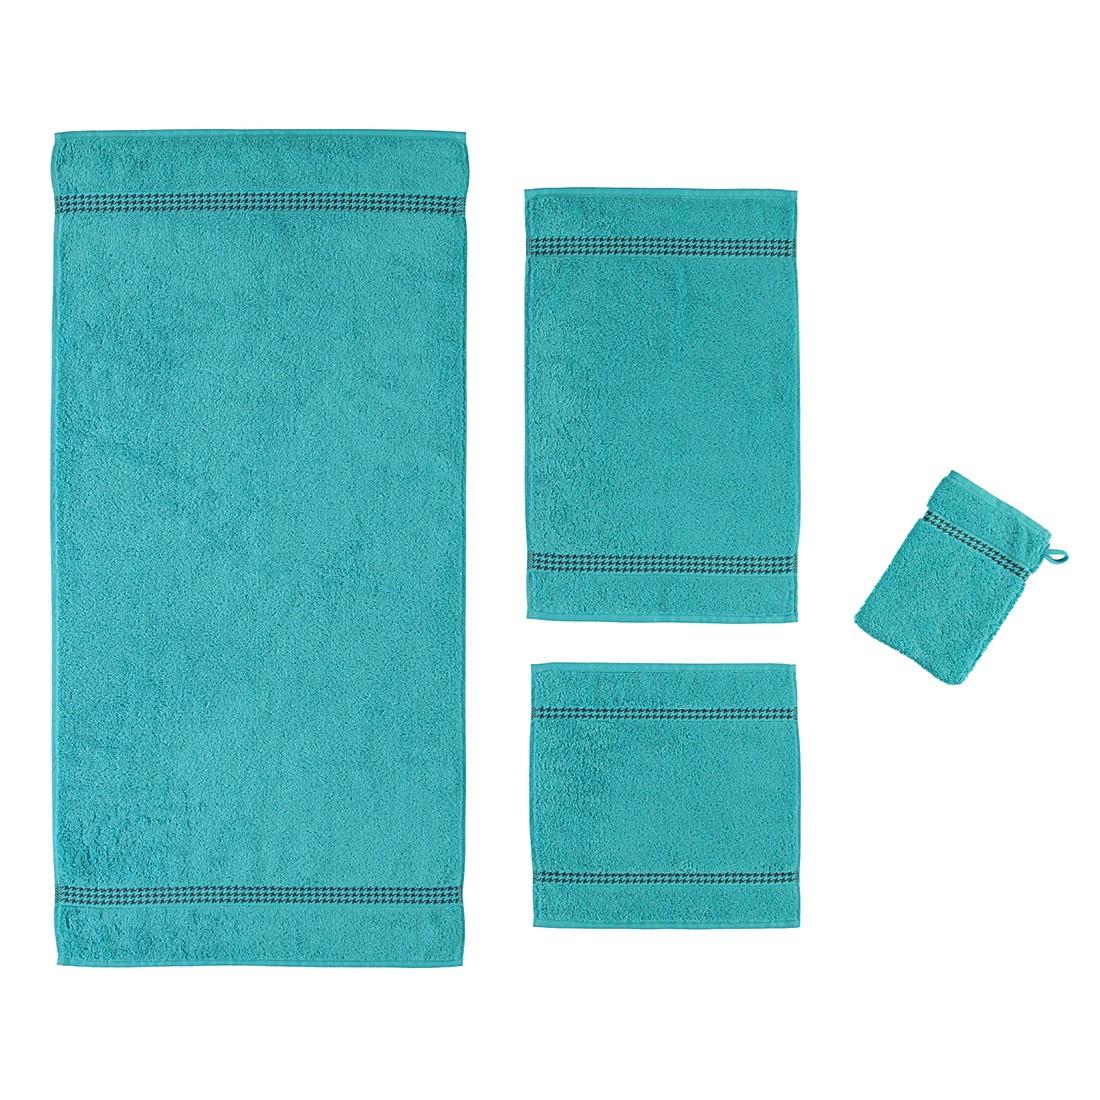 Handtücher Selection Uni 4010 – Baumwolle – Türkis – Handtuch 50×100 cm, Cawö online bestellen